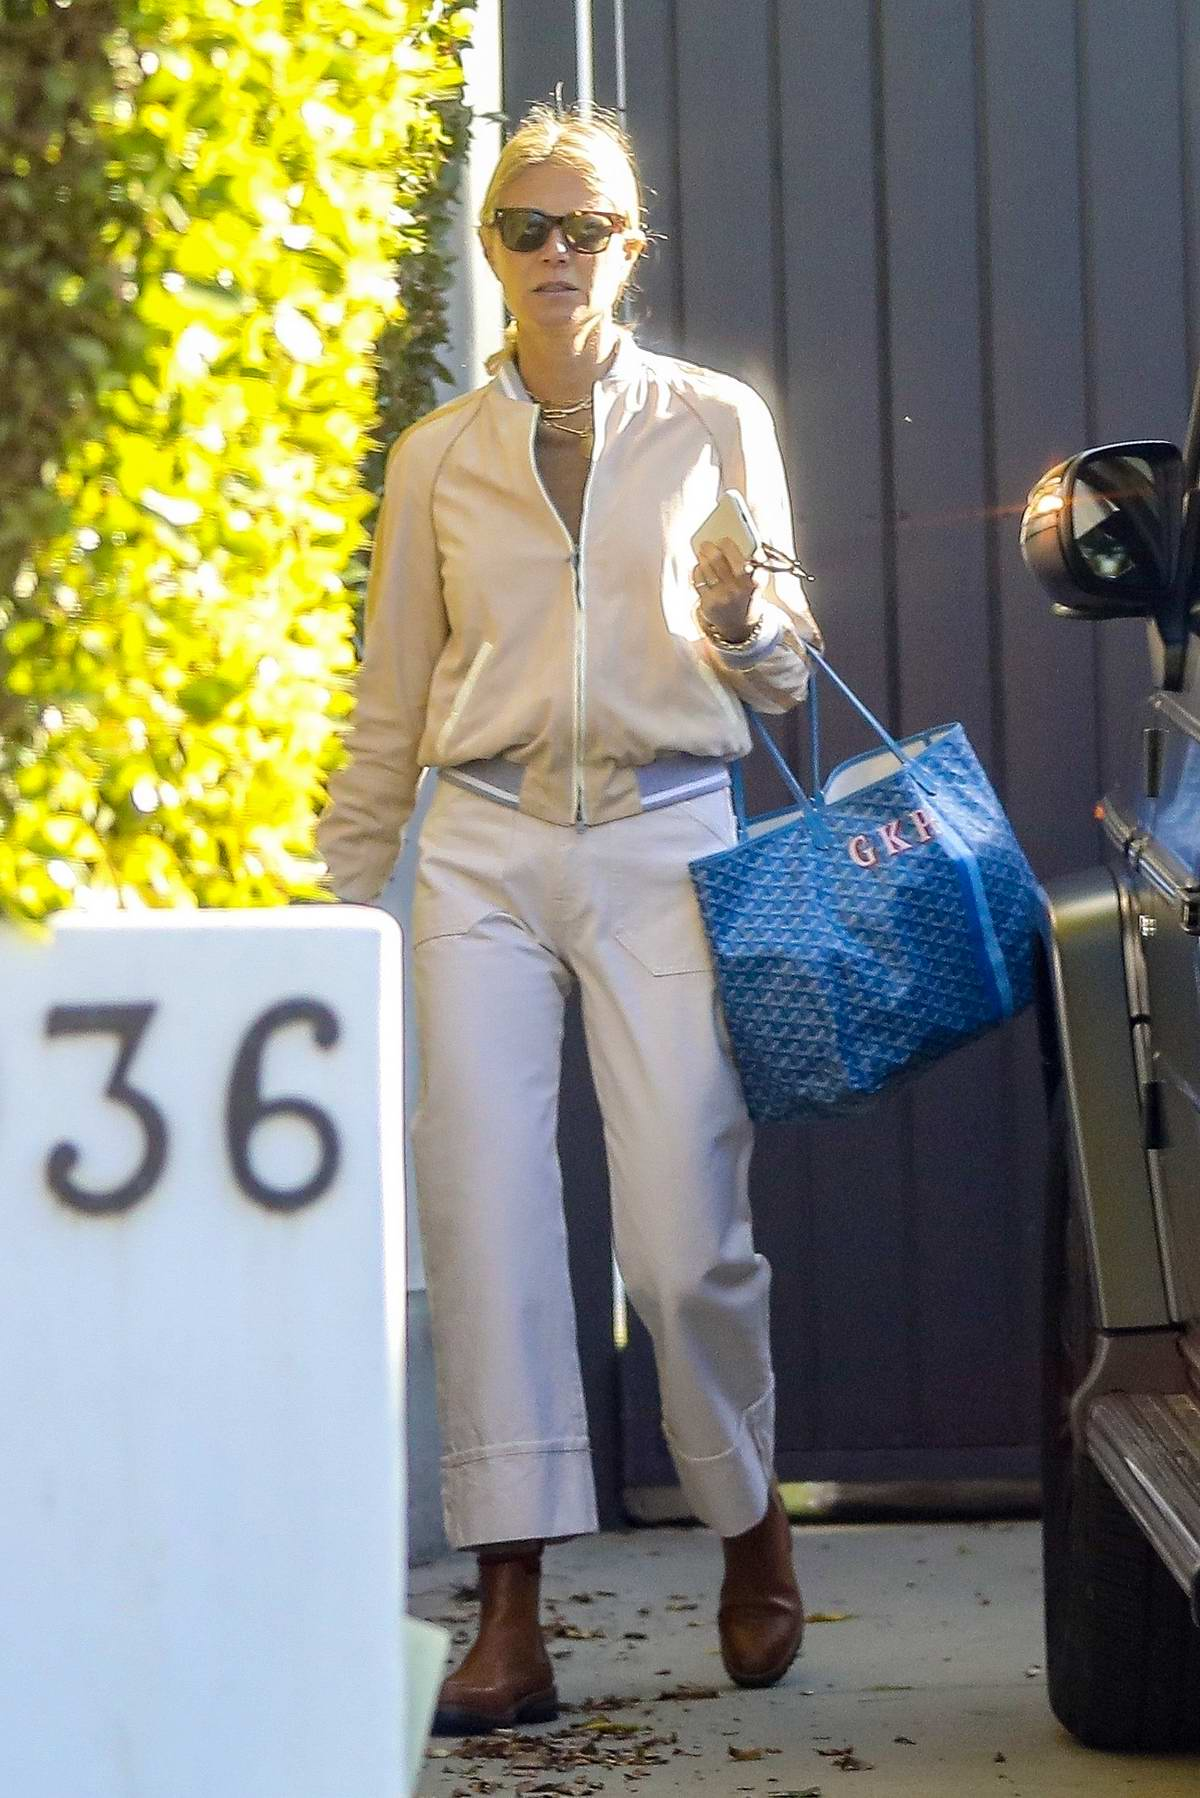 Gwyneth Paltrow seen leaving a private gym in Santa Monica, California